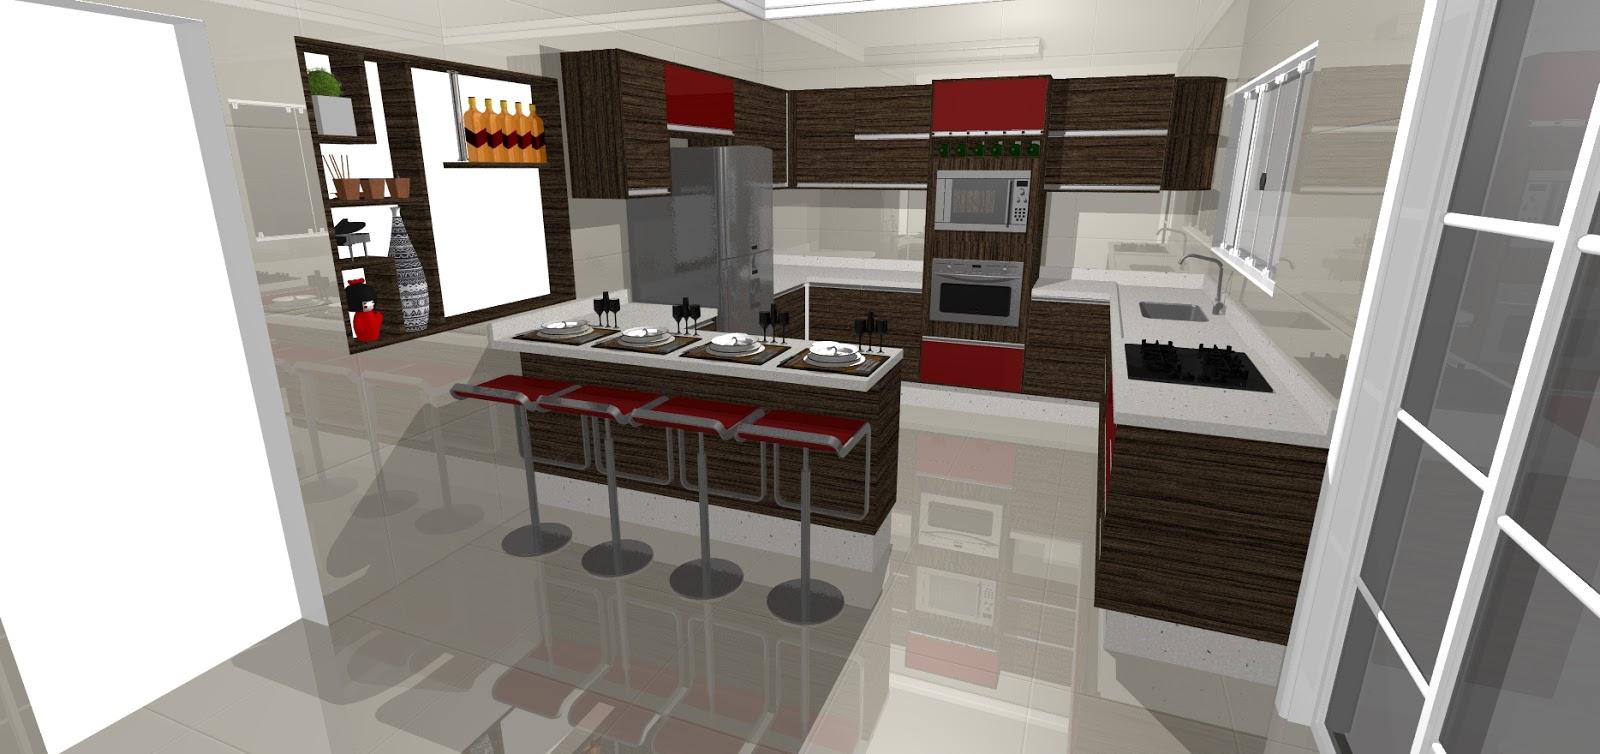 Curso de promob plus projeto da cozinha que vendi neste for Programa para crear cocinas